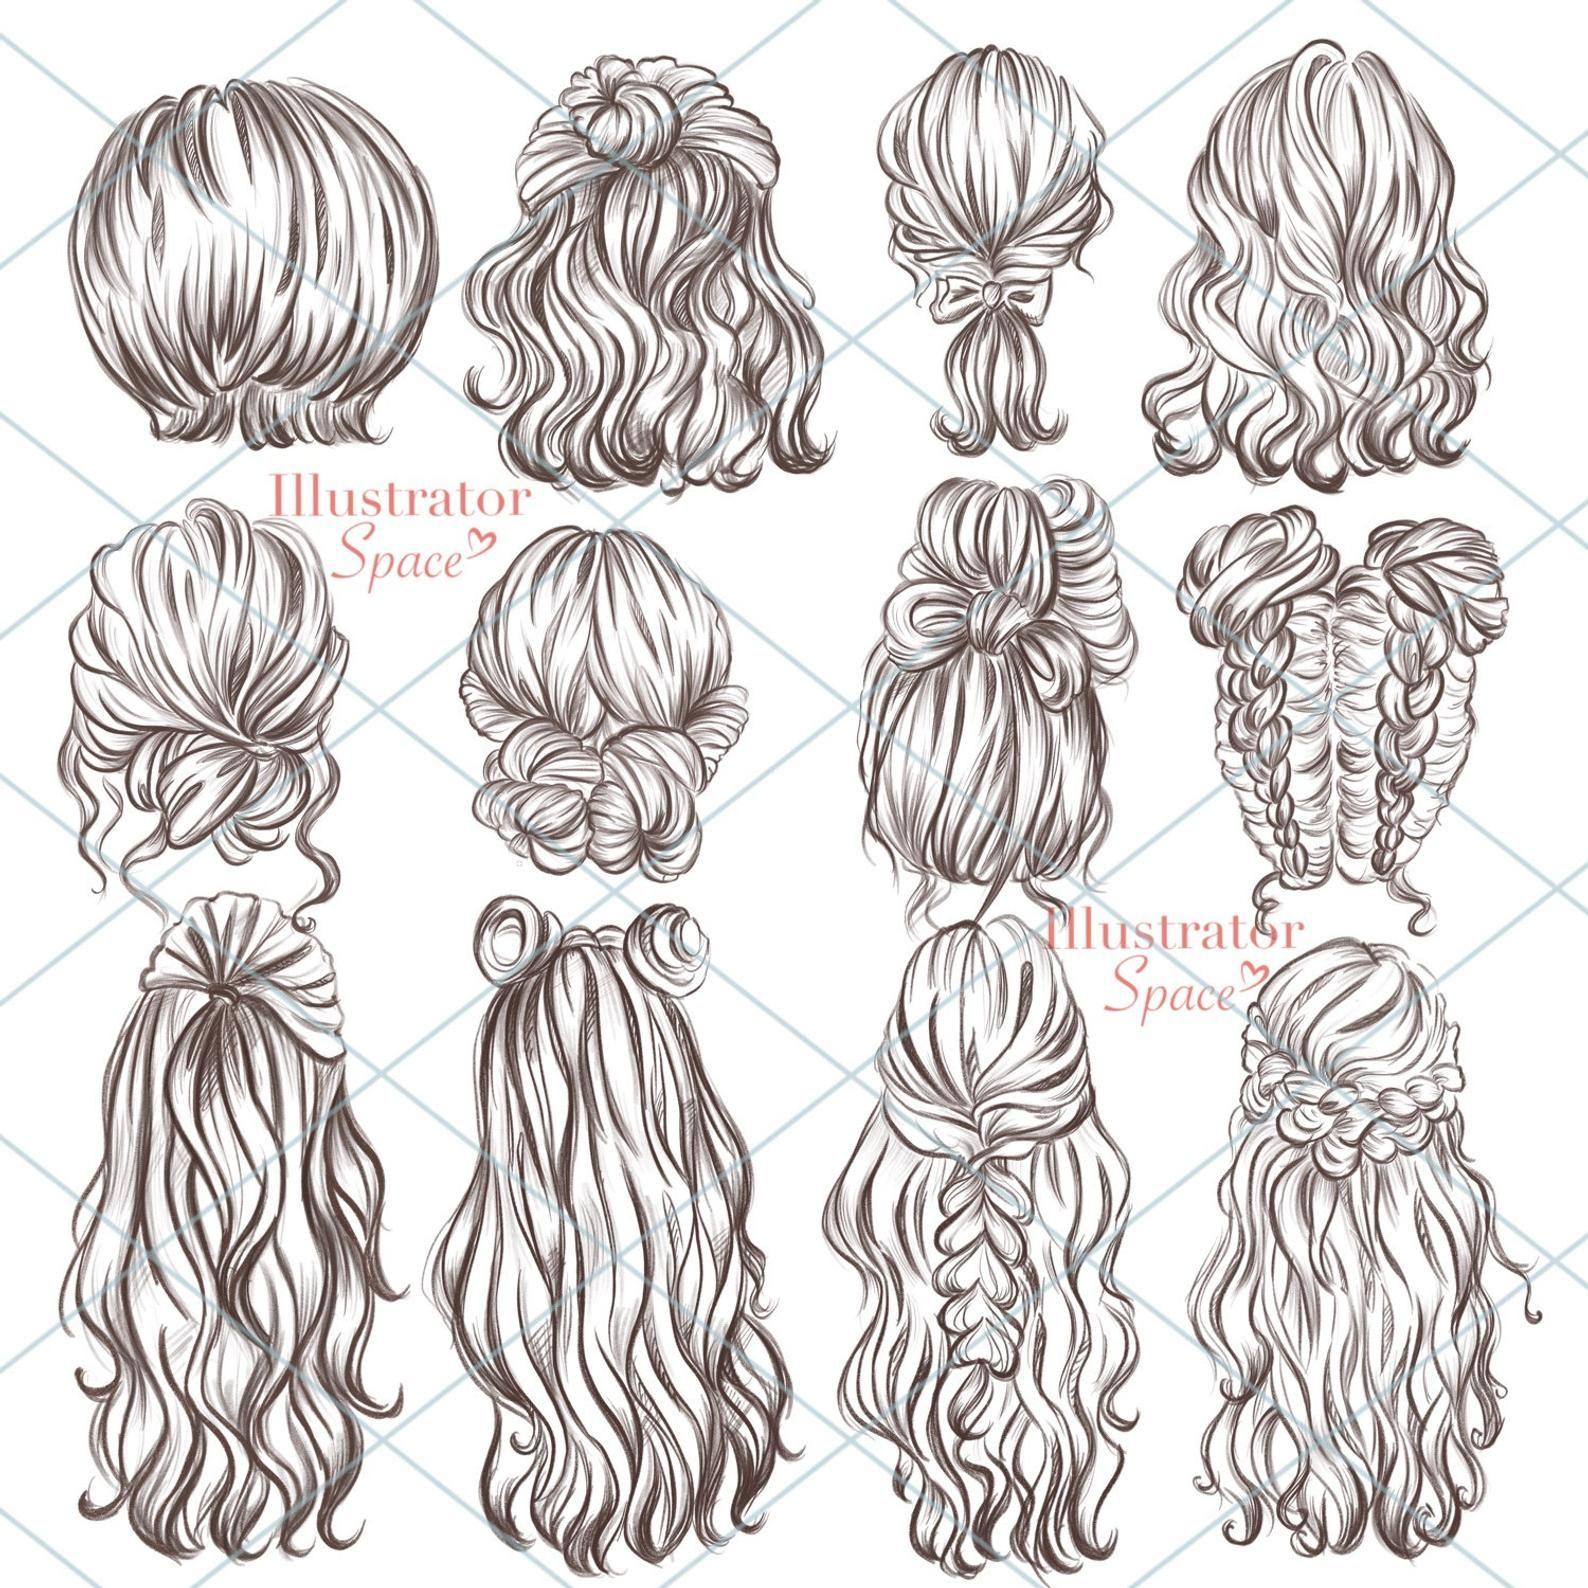 Hairstyles clipart hair set DIGITAL DOWNLOAD Custo